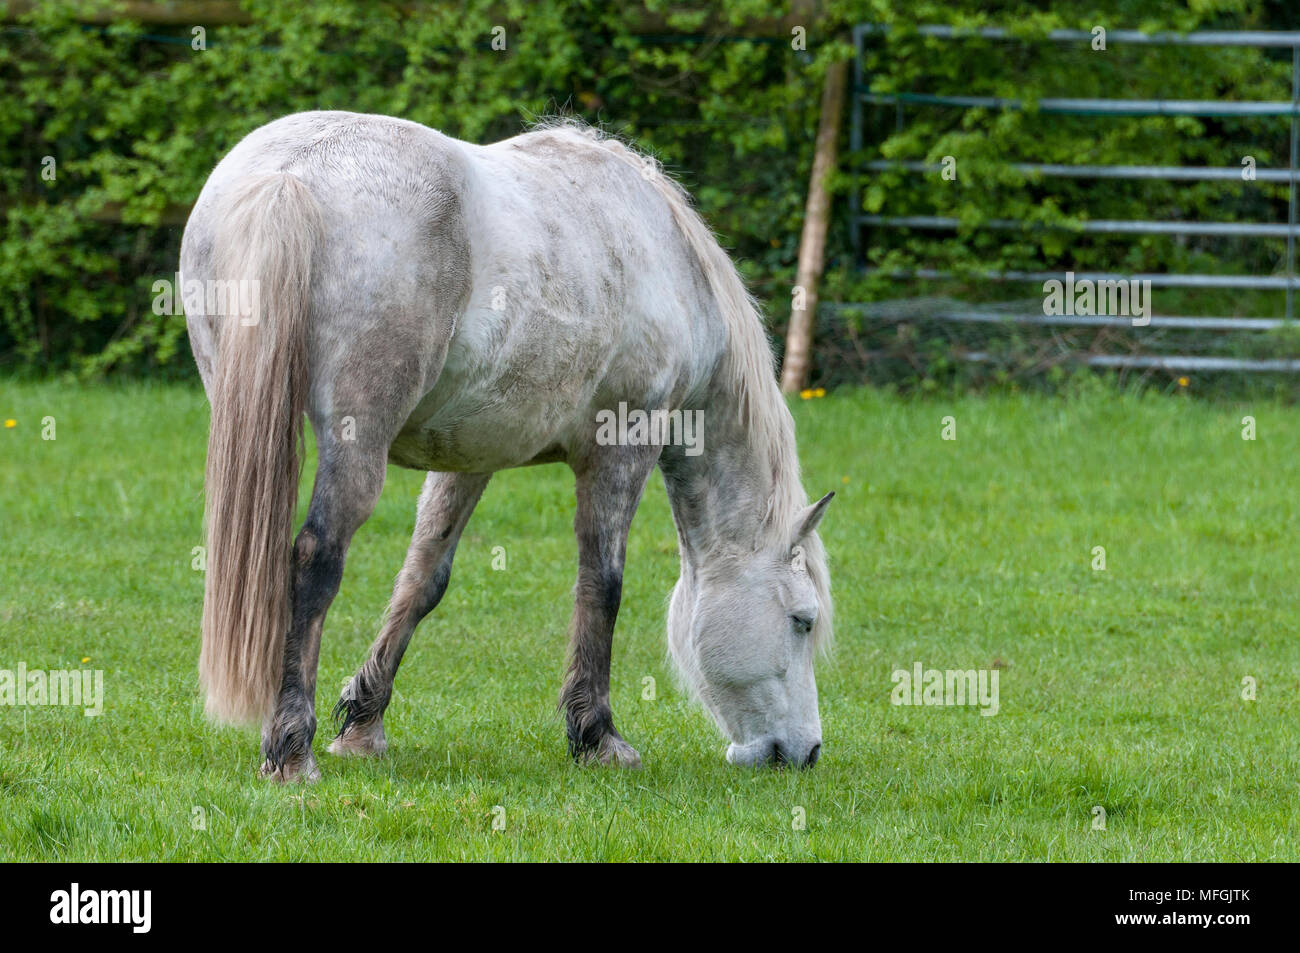 Dappled grey horse grazing grass. - Stock Image